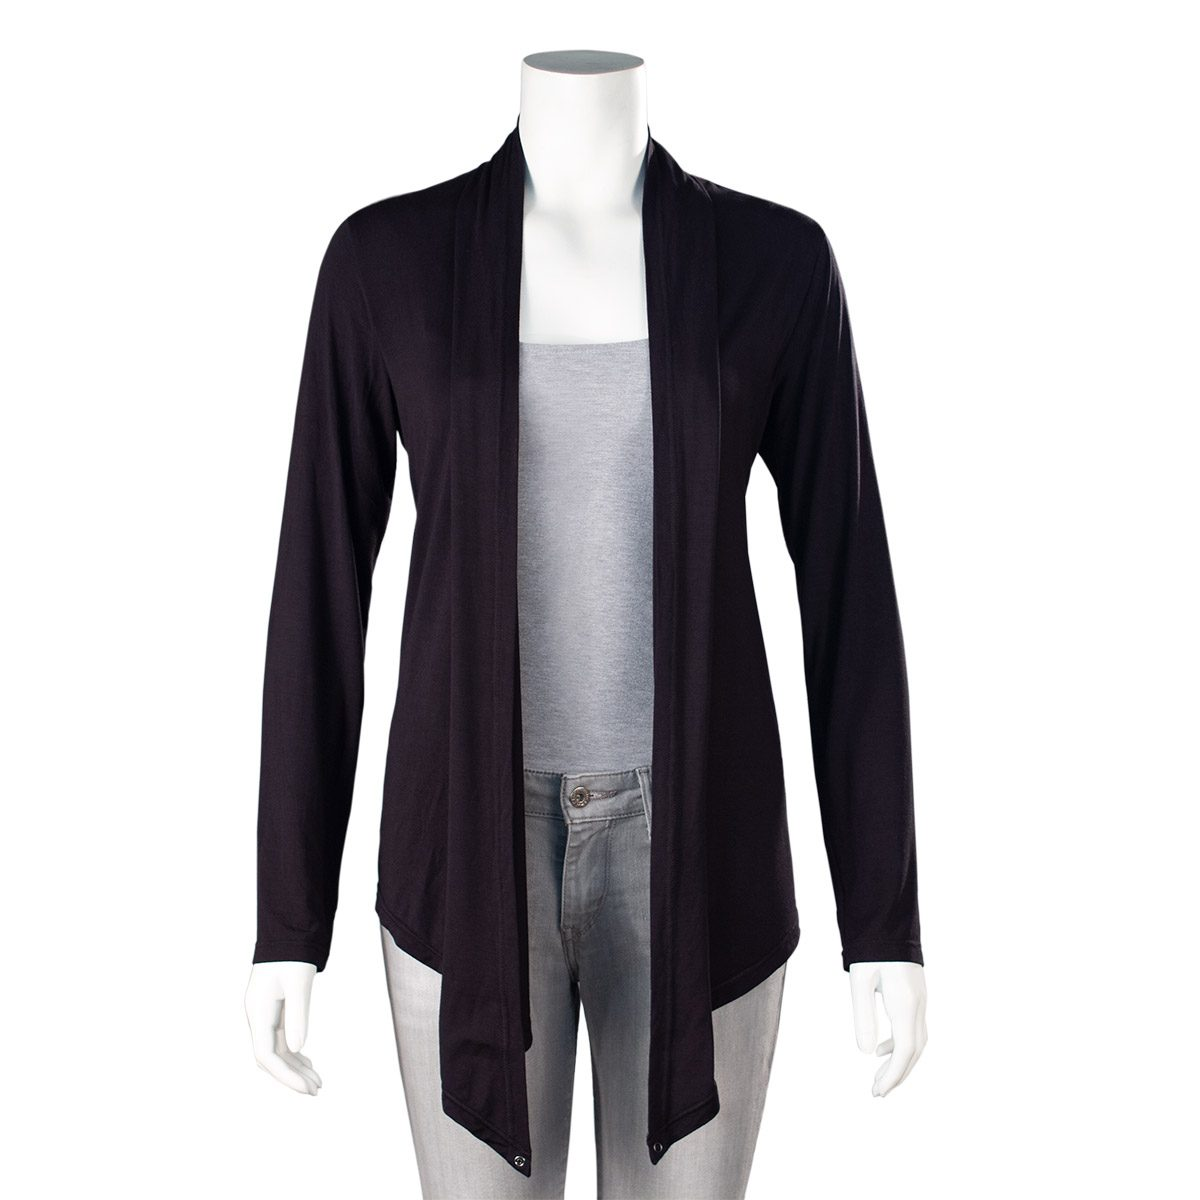 Main View of Elesk Apparel Women's Fashion Evolution Cardigan Product Image